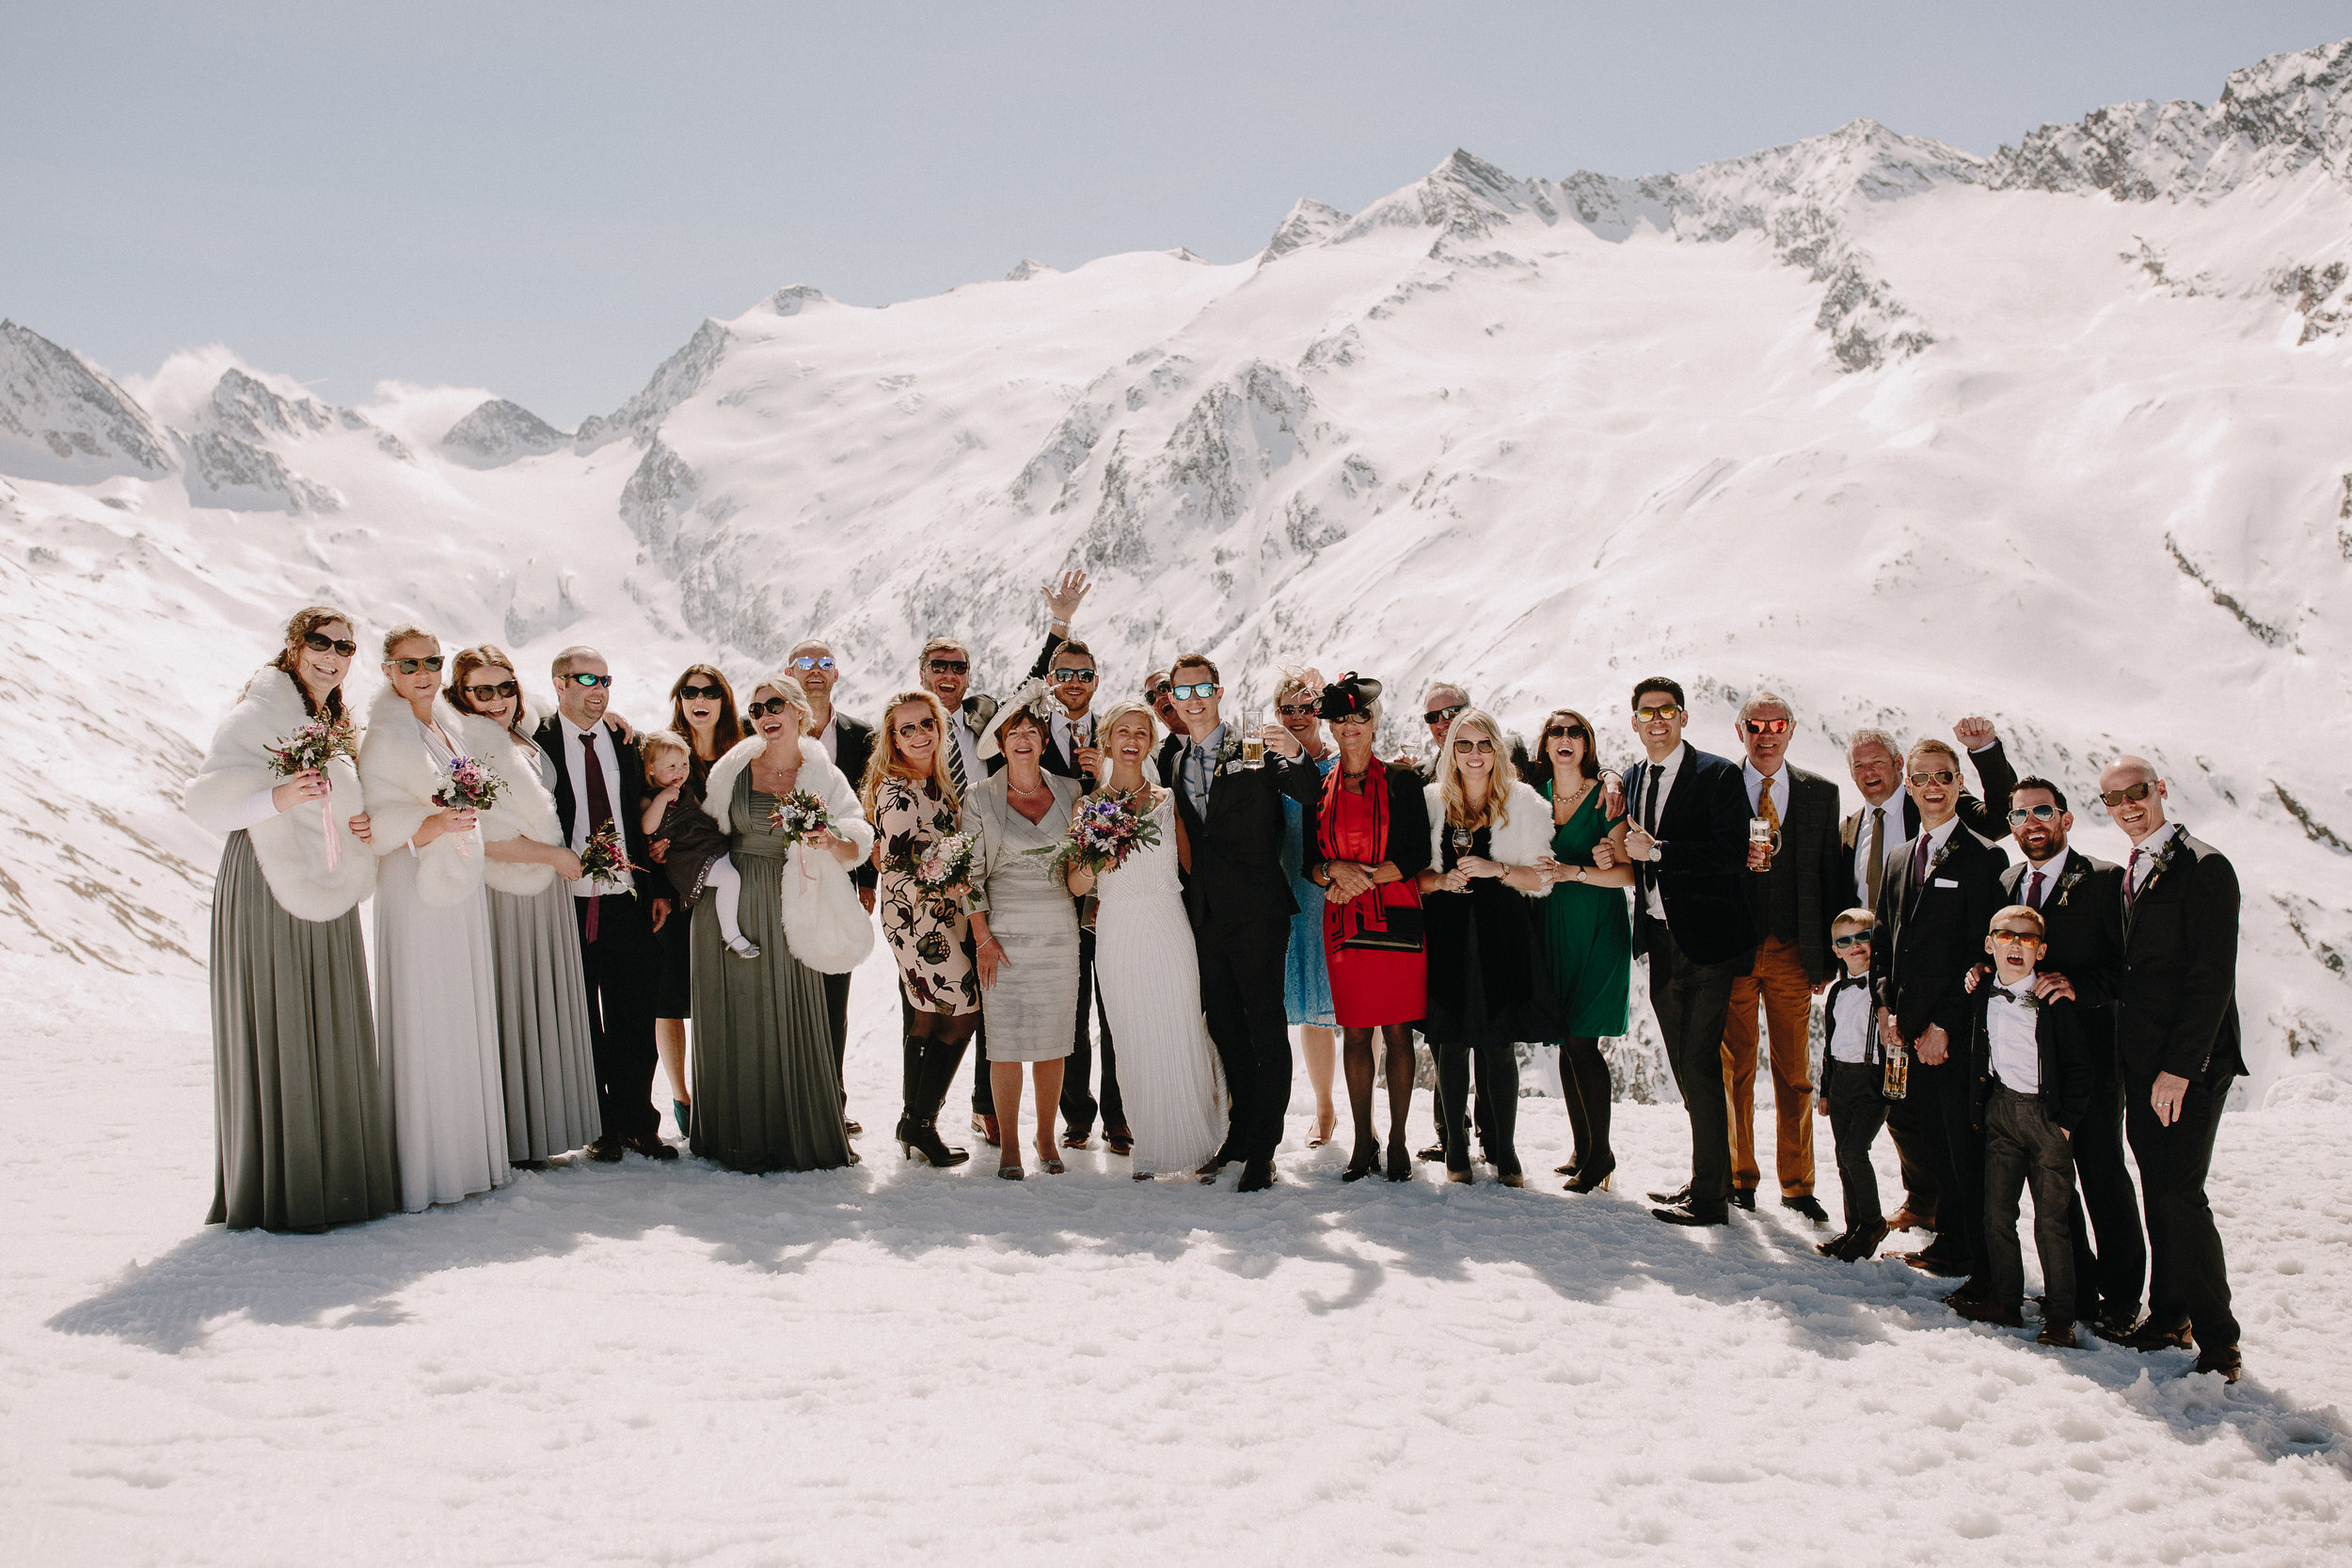 Austria-wedding-obergurgl-hohe-mut-alm.jpg